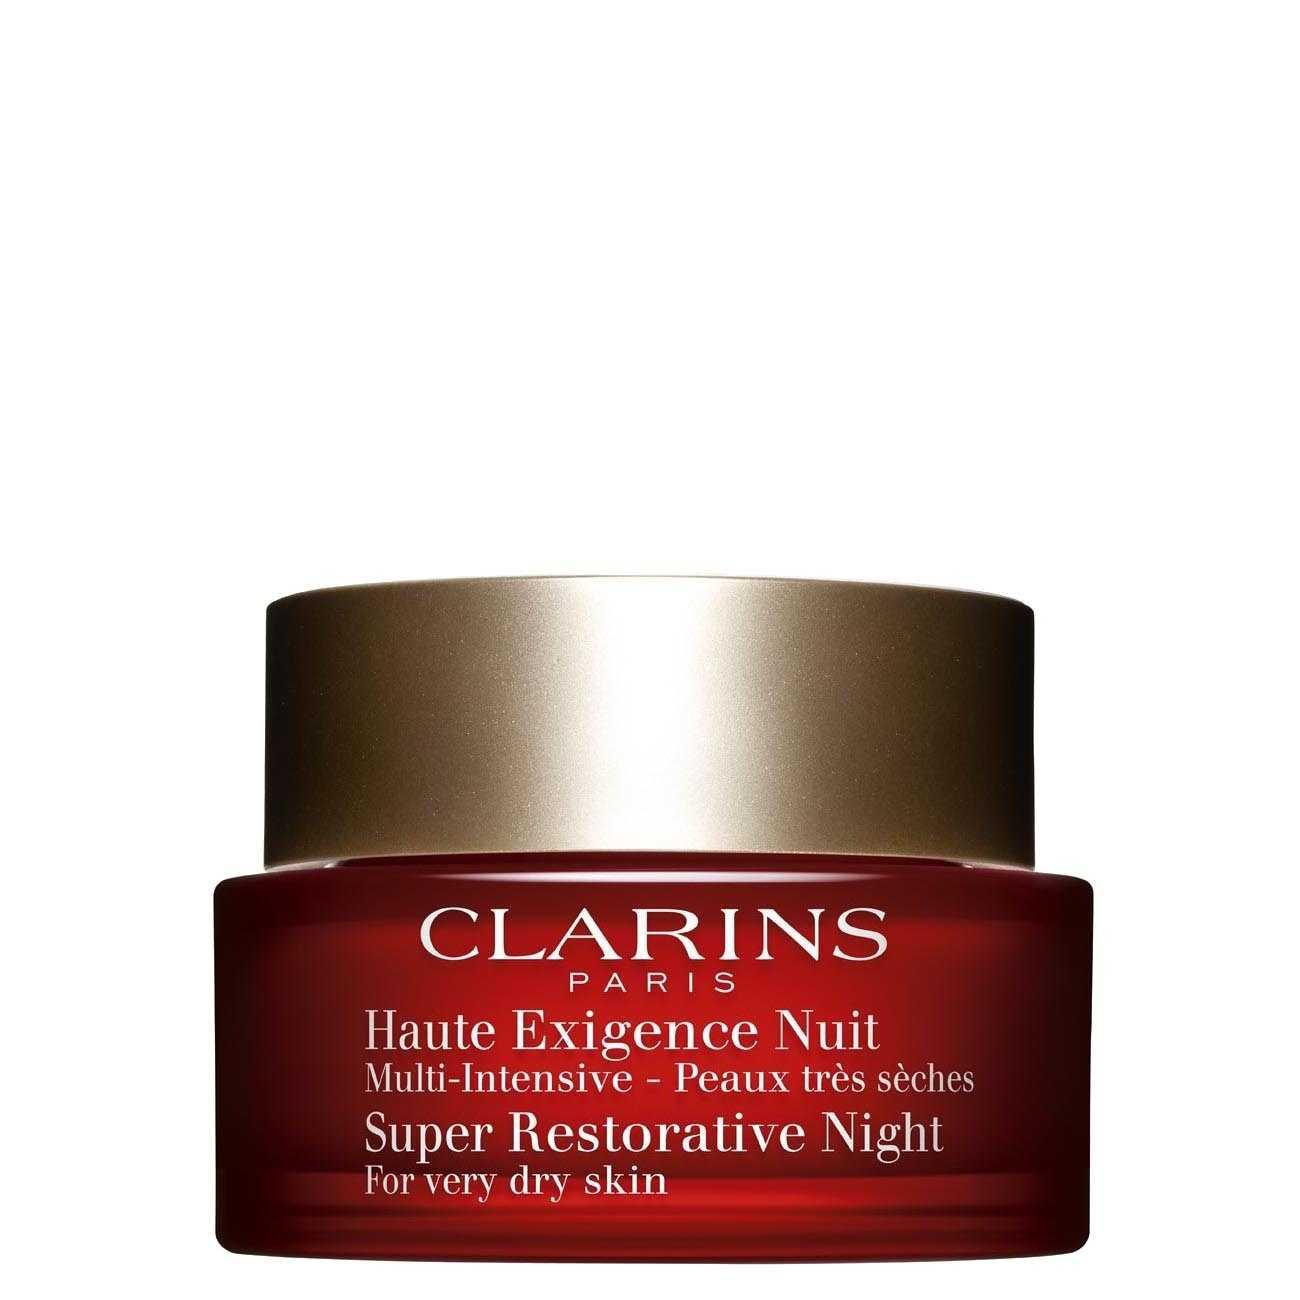 SUPER RESTORATIVE NIGHT 50 ML